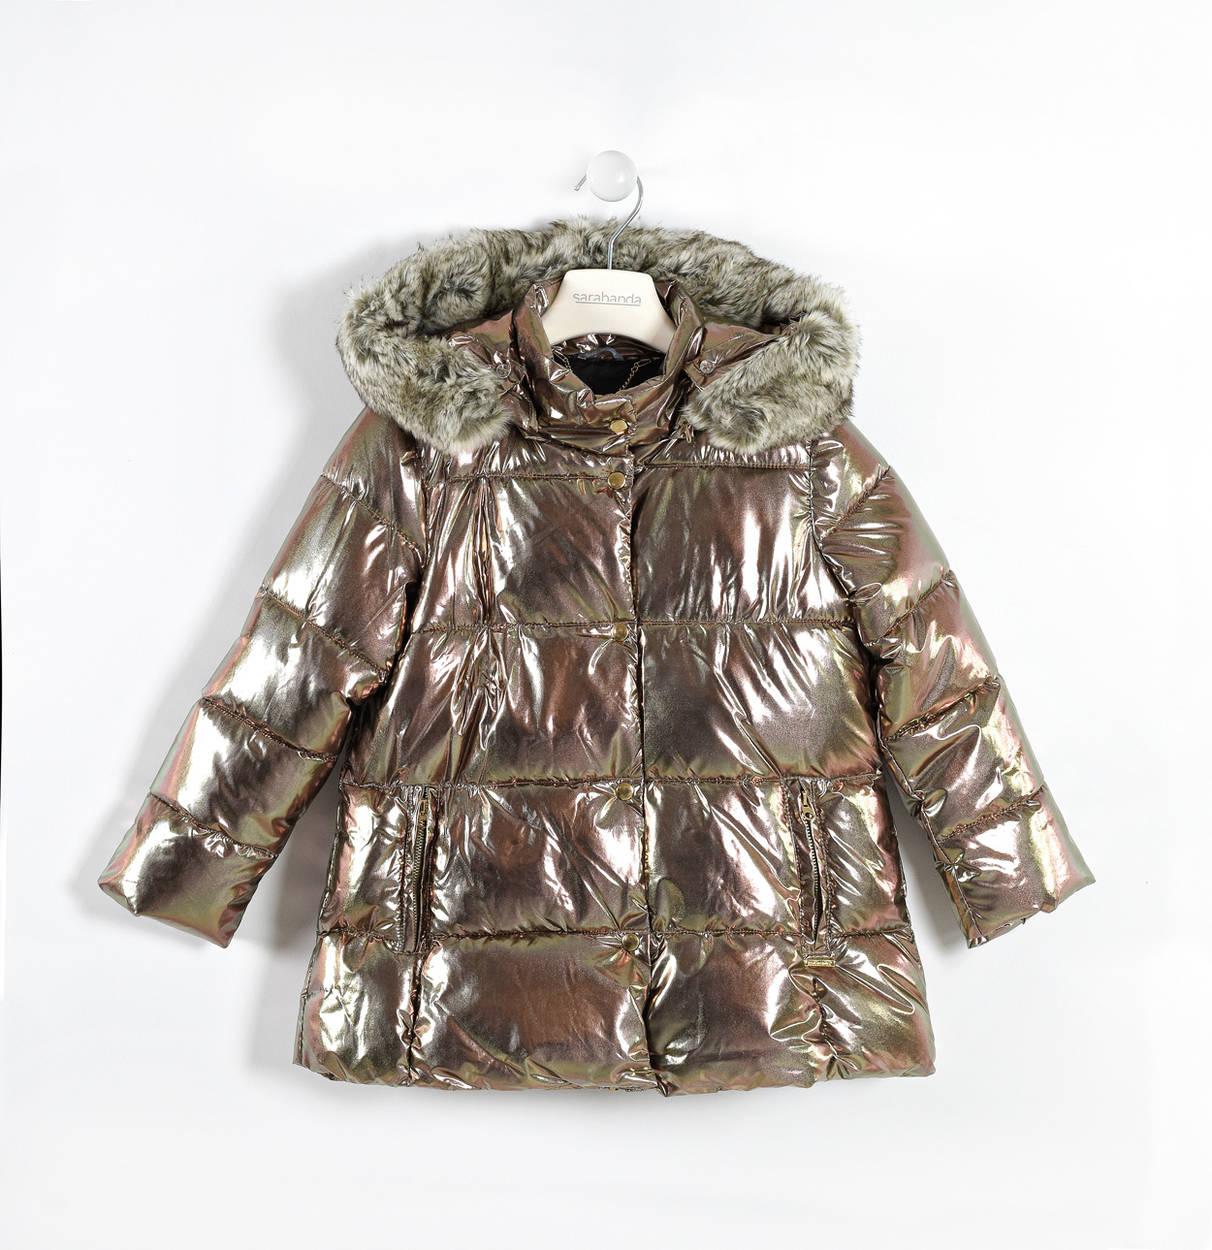 Sarabanda Metallic Fabric Padded Jacket With Polka Dot Satin Lining For Girls From 6 To 16